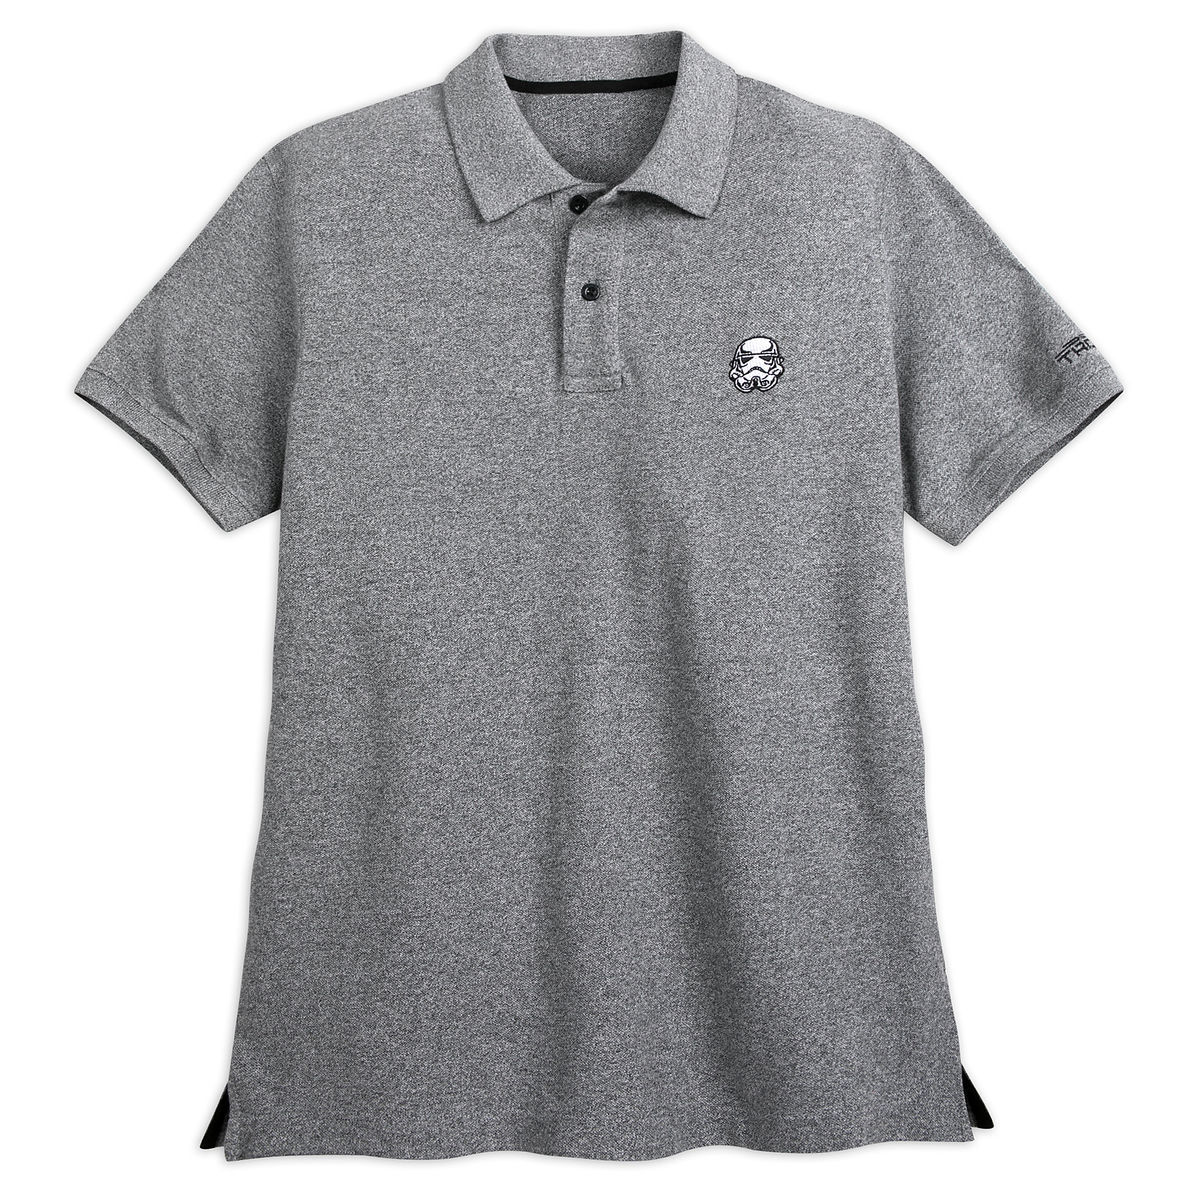 Stormtrooper Polo Shirt For Men Star Wars Shopdisney